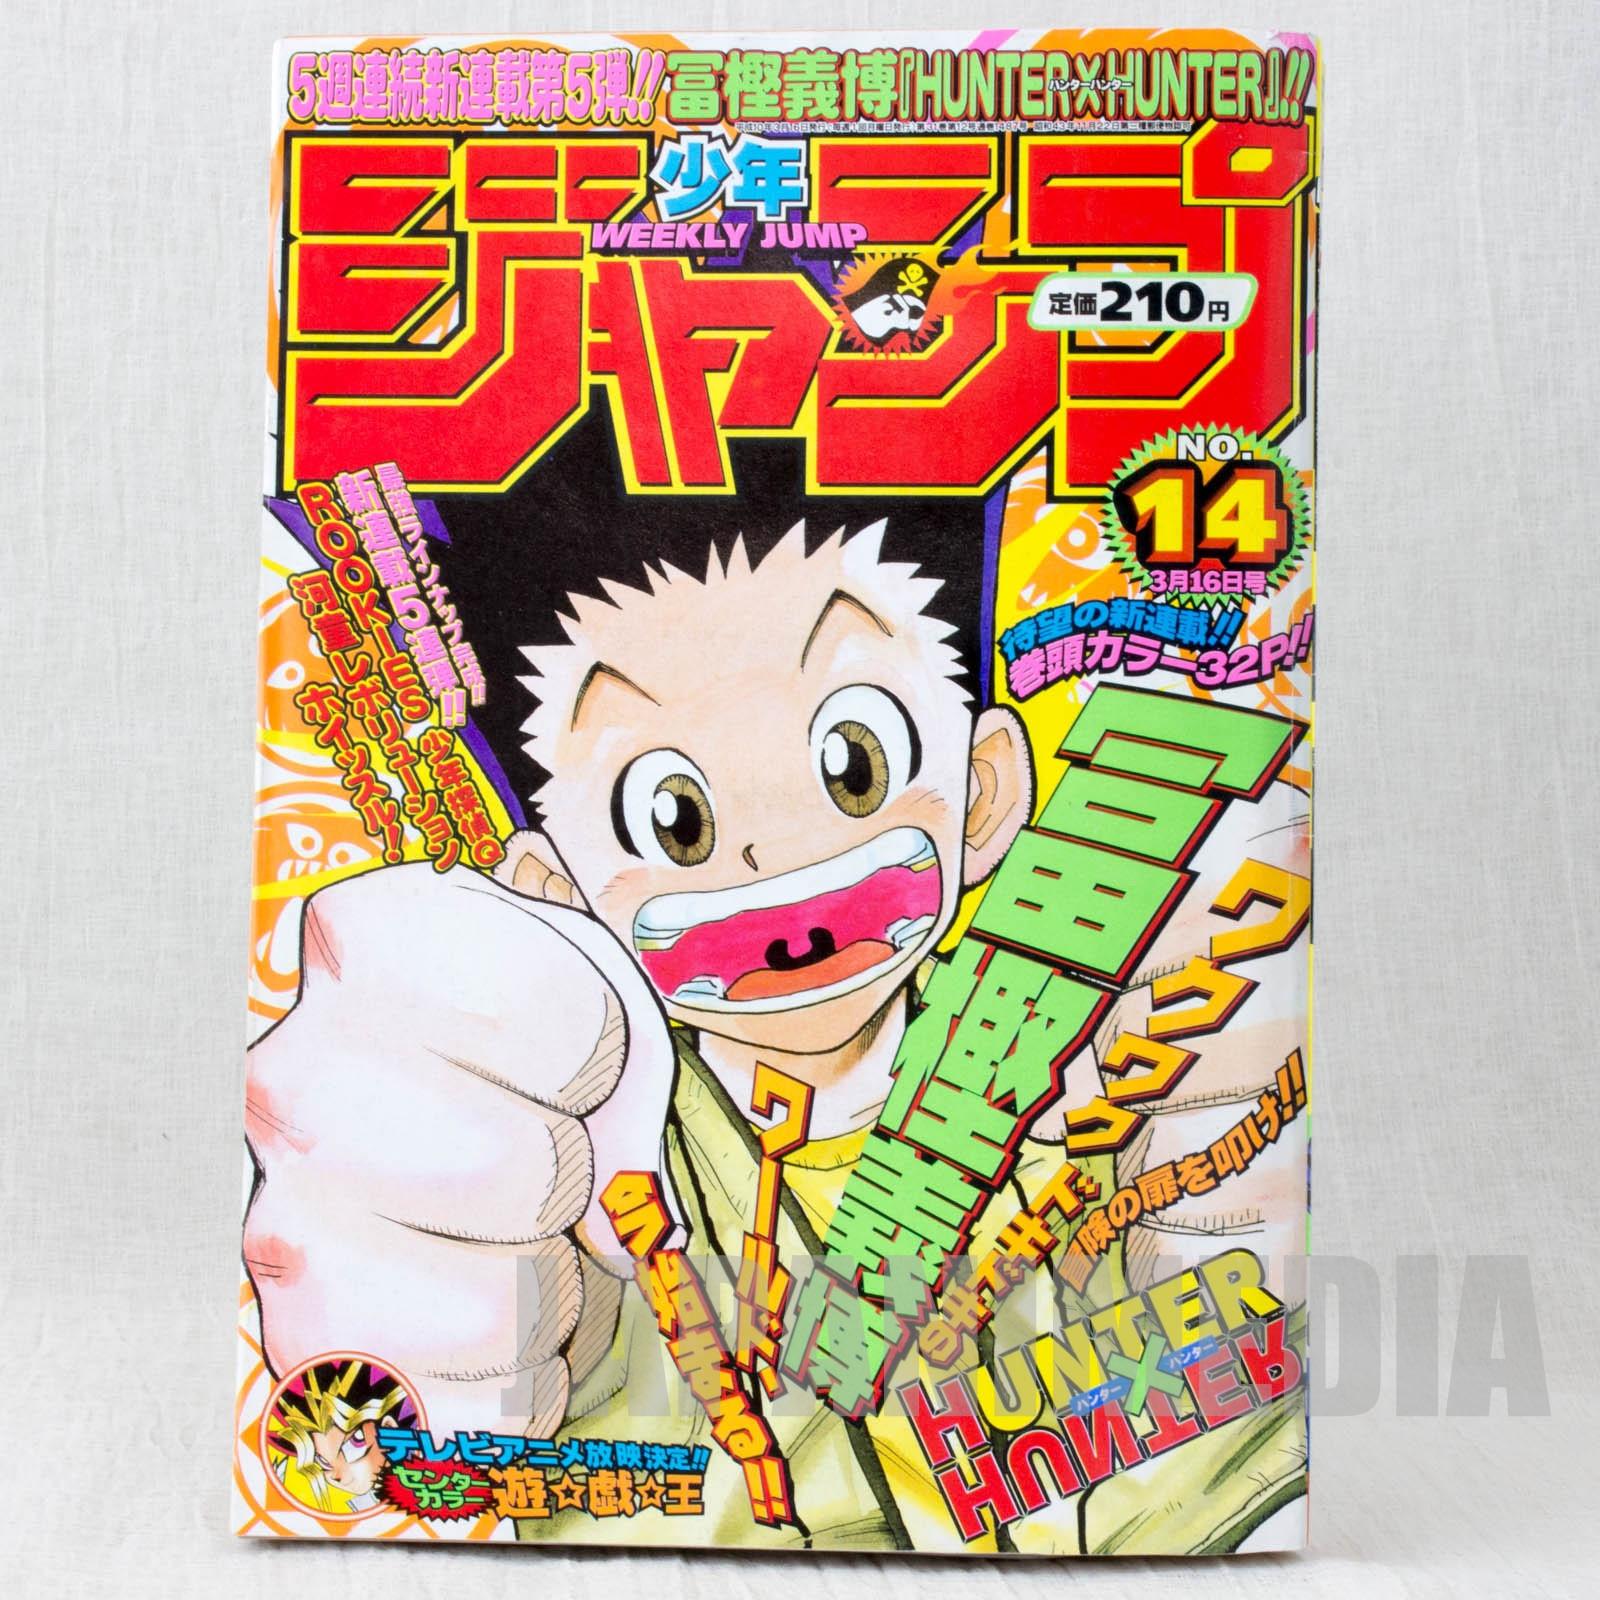 RARE!! Weekly Shonen JUMP Vol.14 1998 Hunter x Hunter / Japanese Magazine JAPAN MANGA